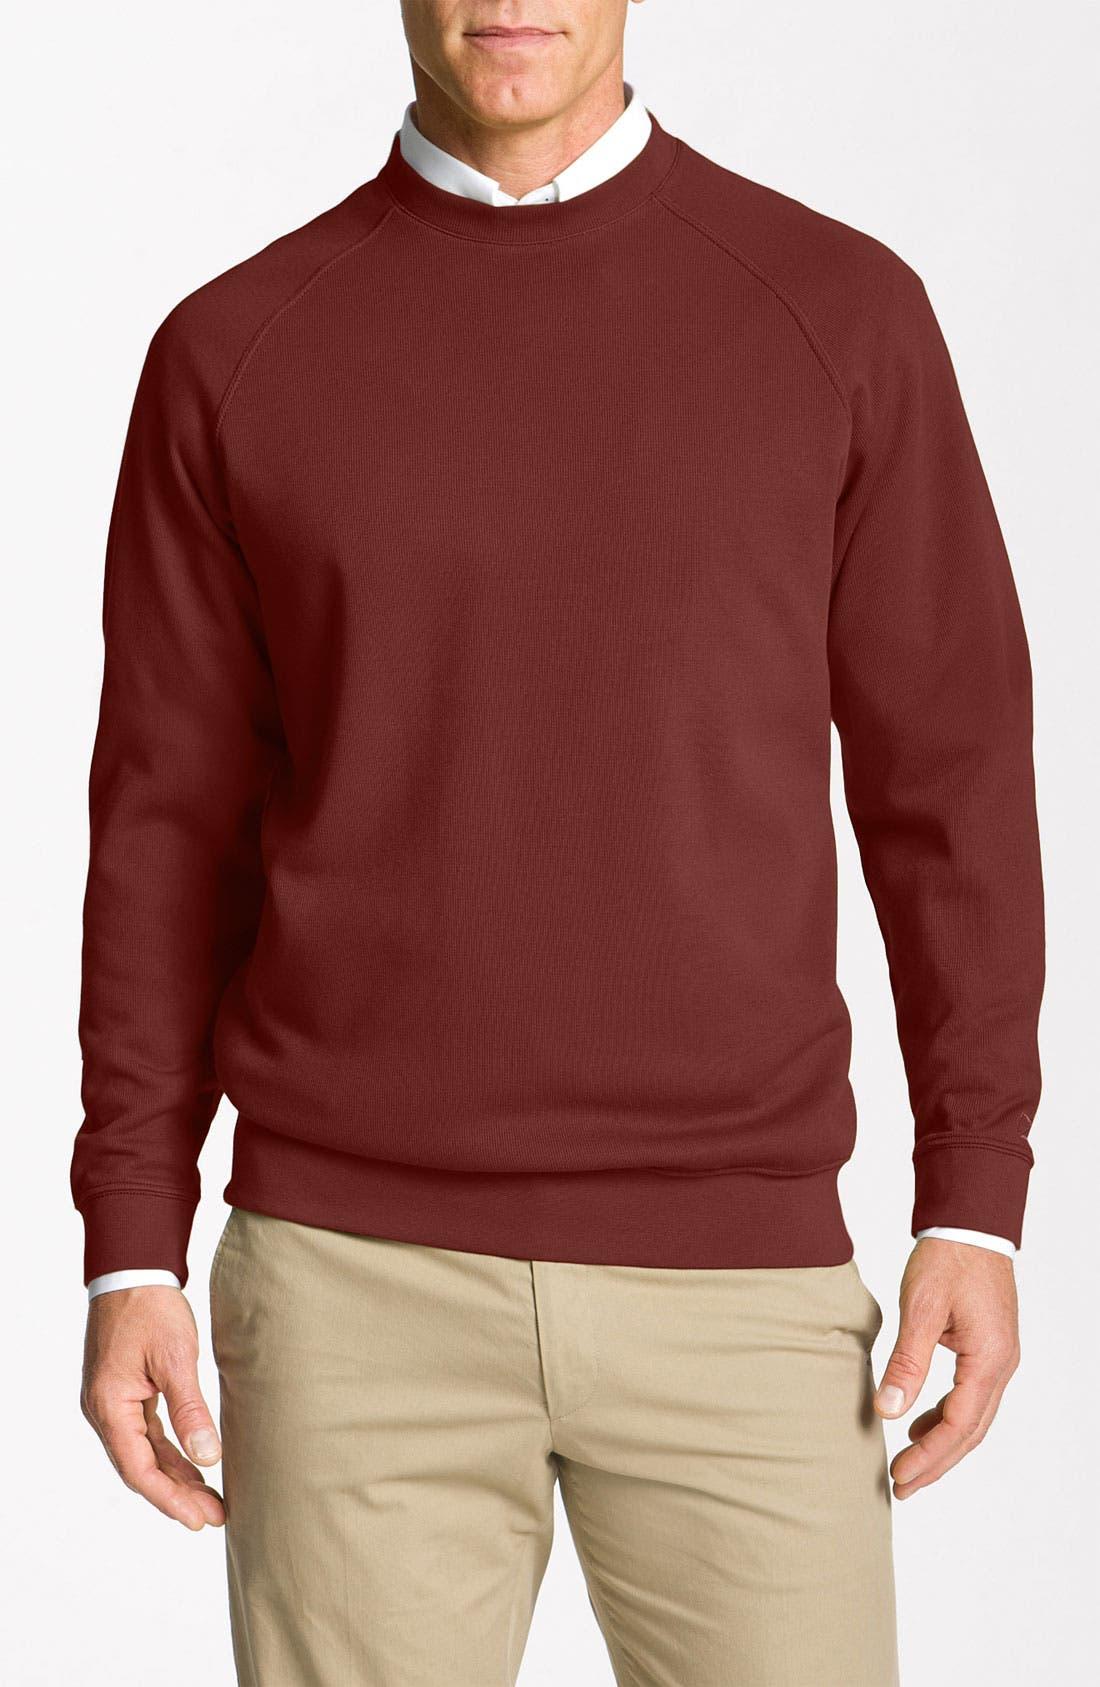 Alternate Image 1 Selected - Cutter & Buck 'Canoe Ridge' Crewneck Sweater (Big & Tall) (Online Exclusive)